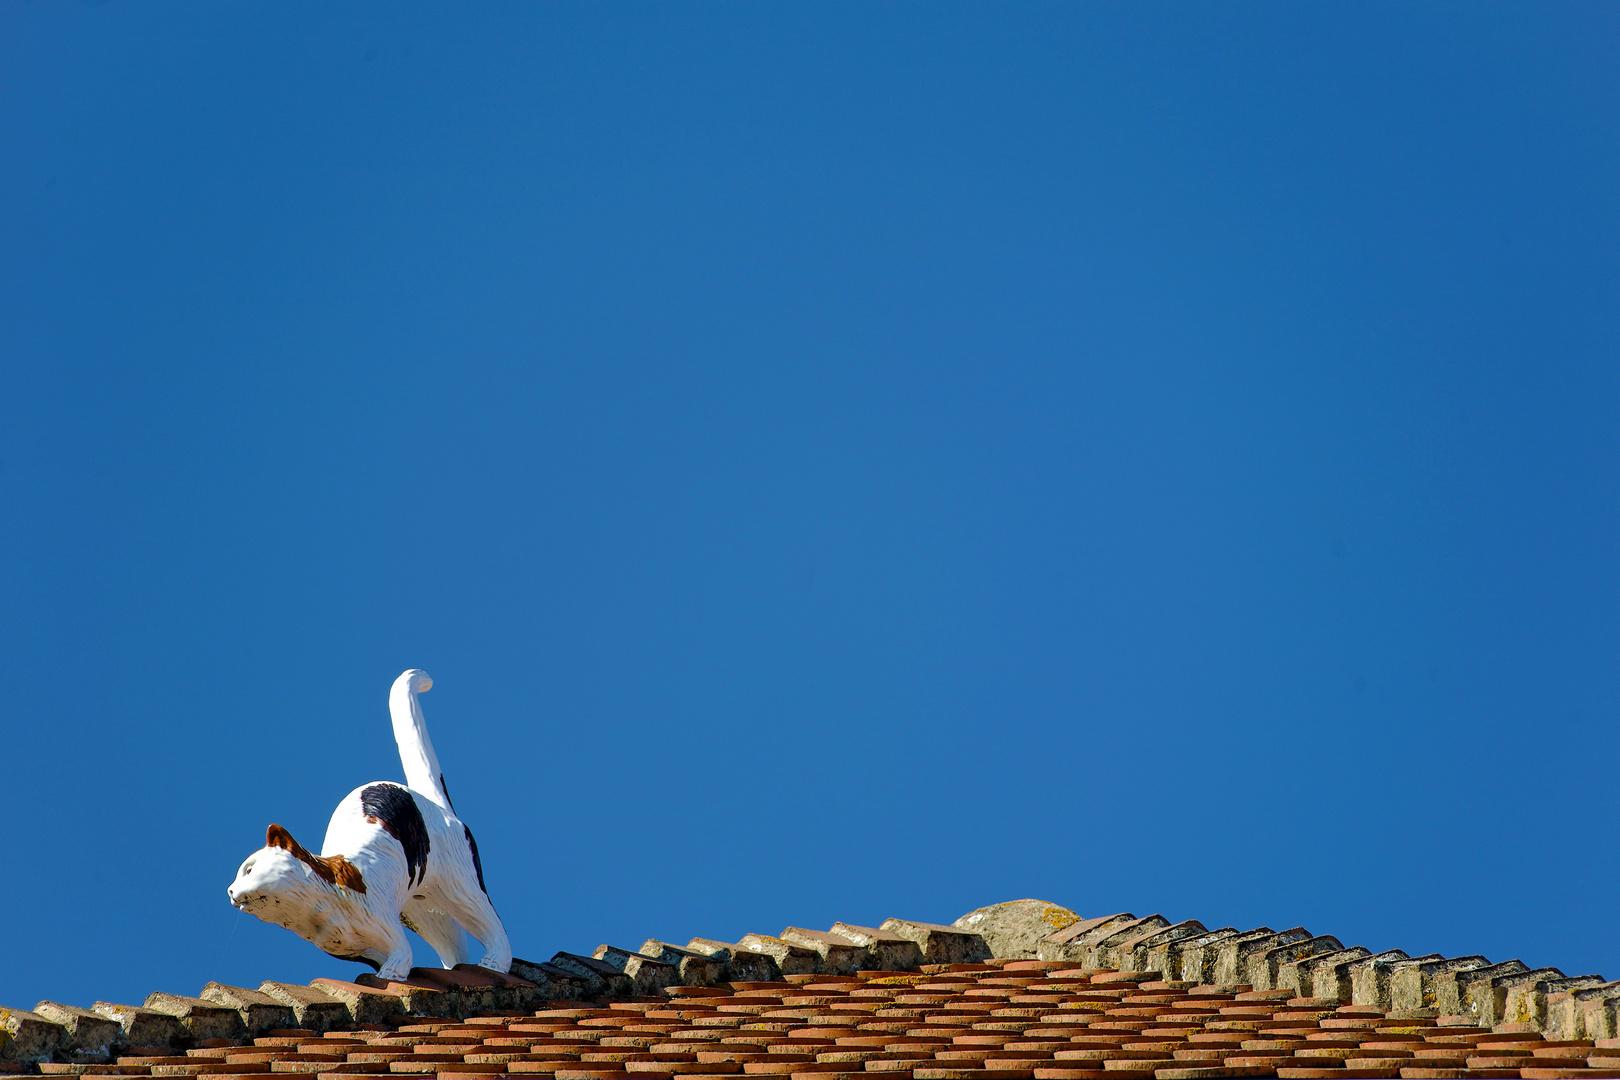 a false cat on the roof